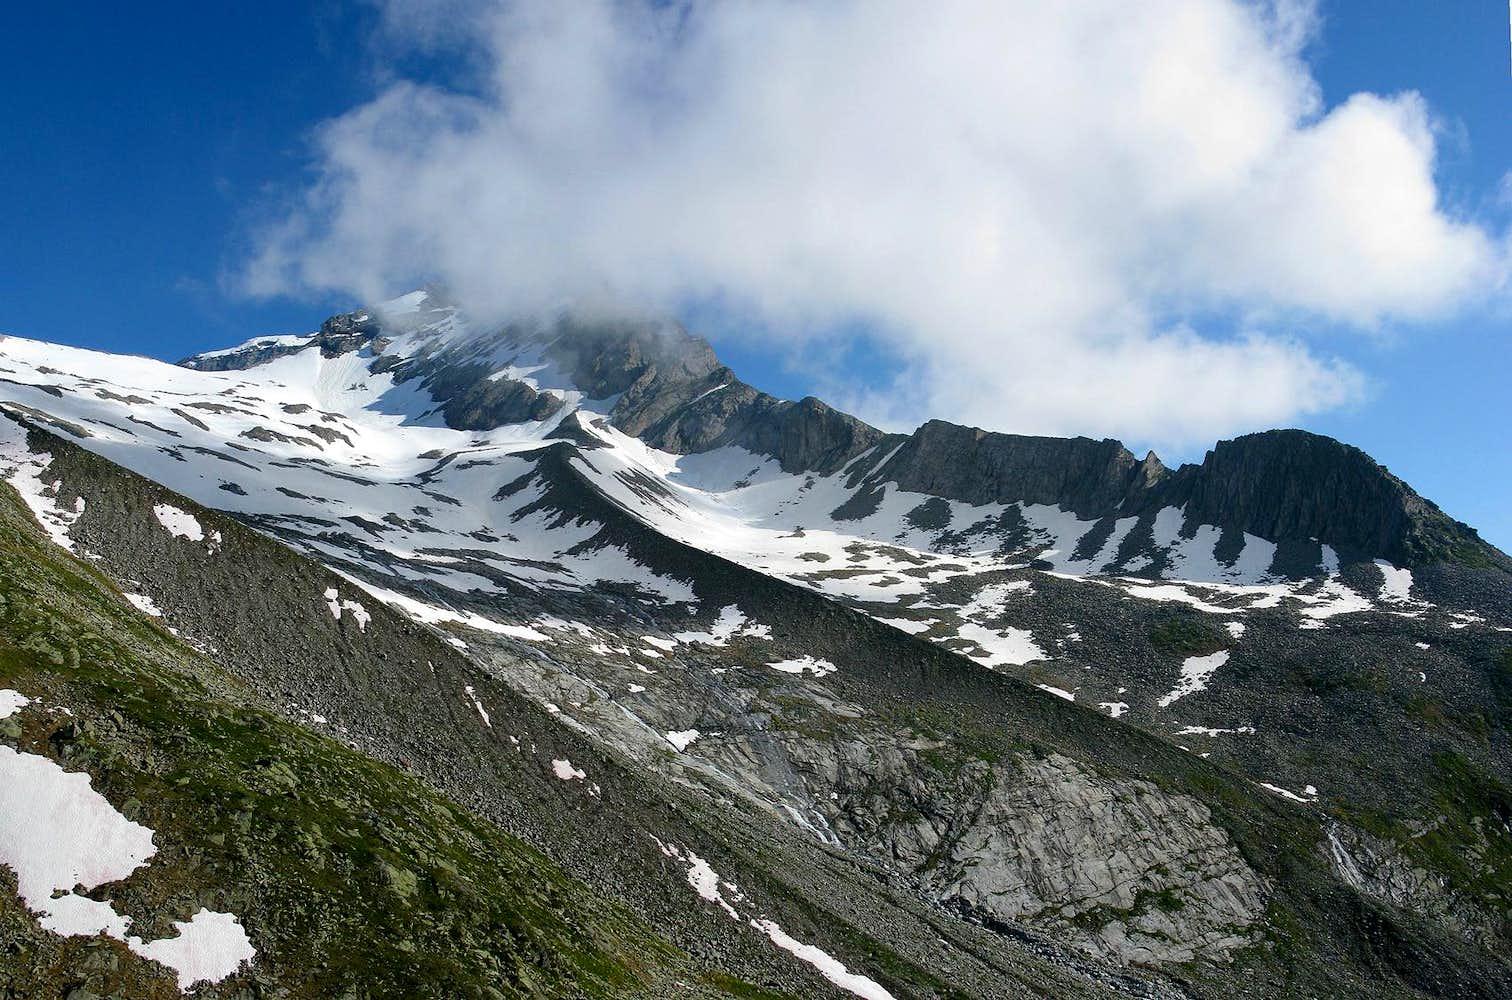 Zillertal Alps : Photos, Diagrams & Topos : SummitPost